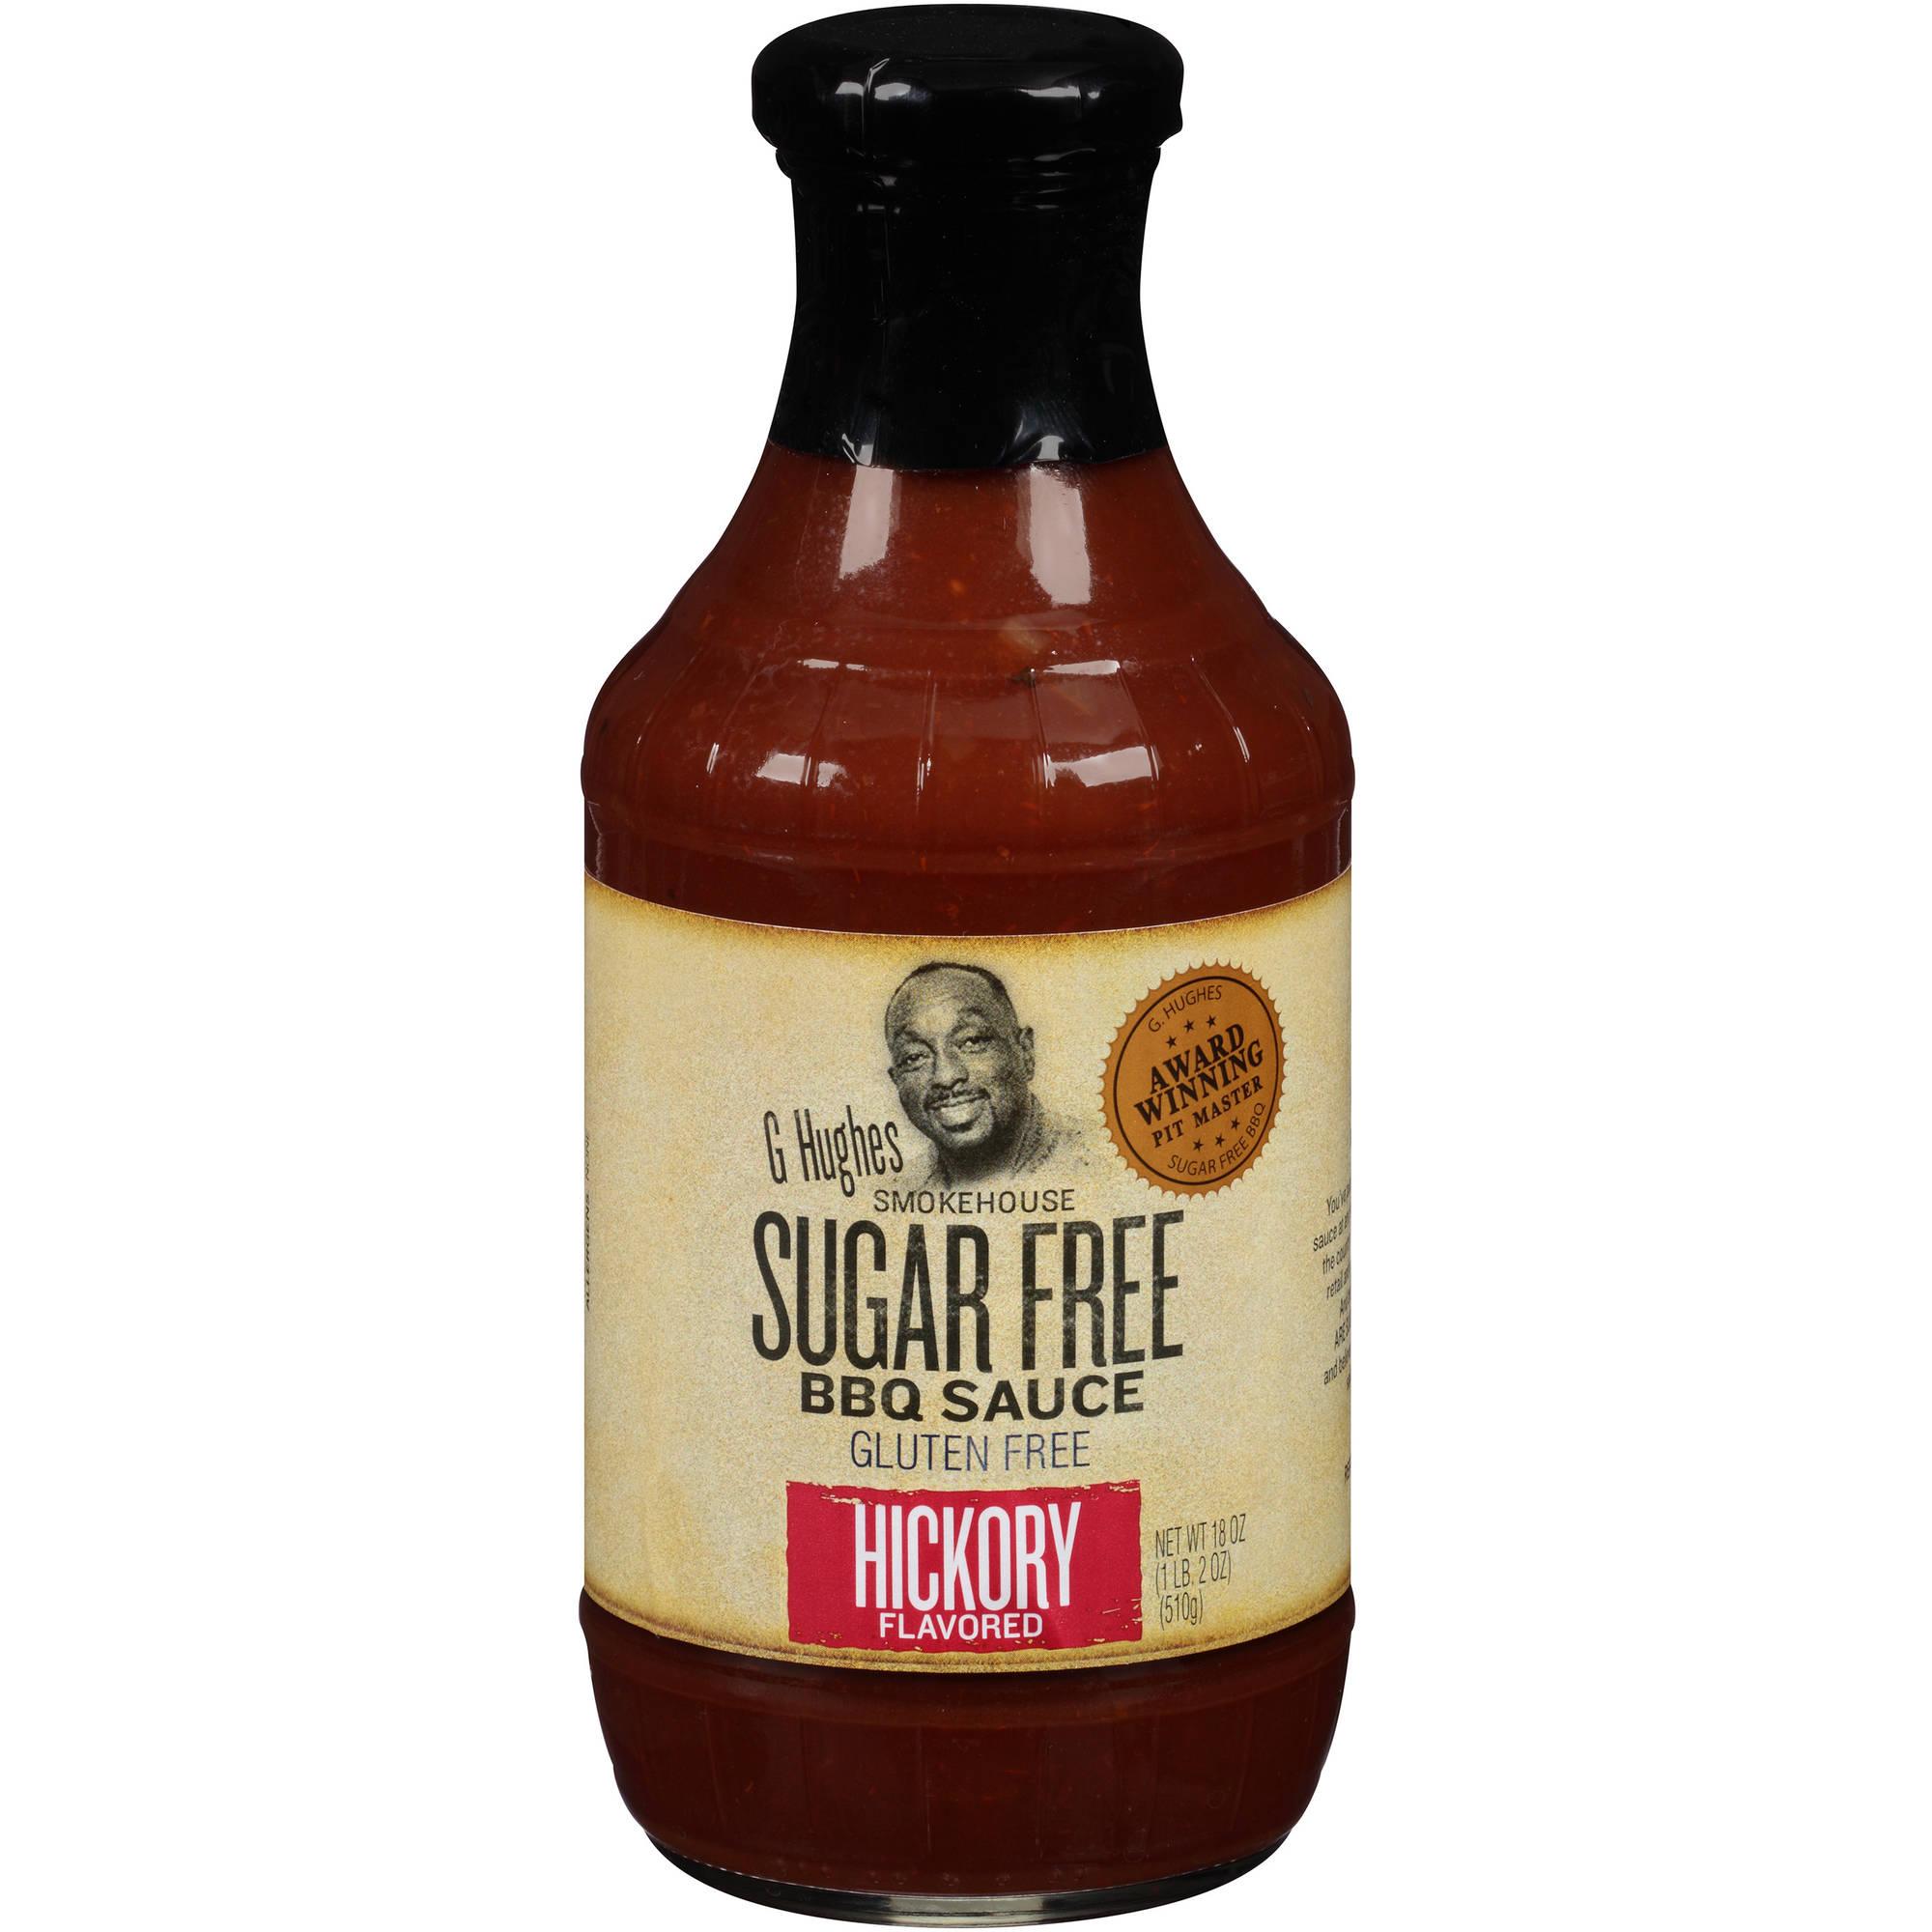 G Hughes Smokehouse Sugar Free Hickory Flavored BBQ Sauce, 18 oz